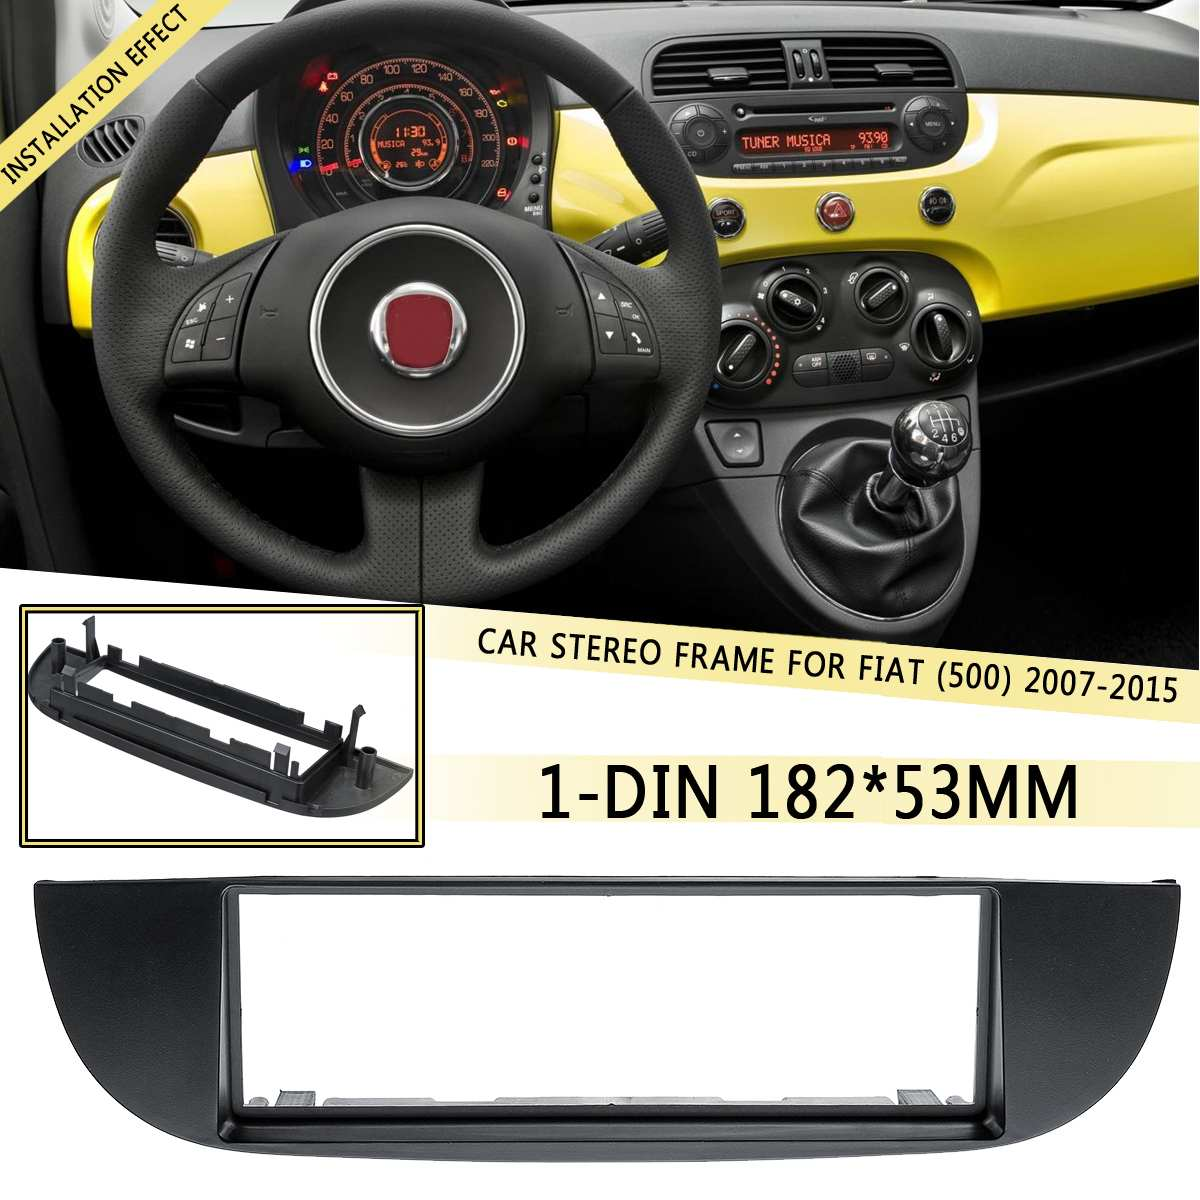 1 DIN Car DVD/CD Radio Stereo Frame Facia Panel Trim Adapter Dash kit For Fiat (500) 2007 2008 2009 2010 2011 2012-2015 182x53mm